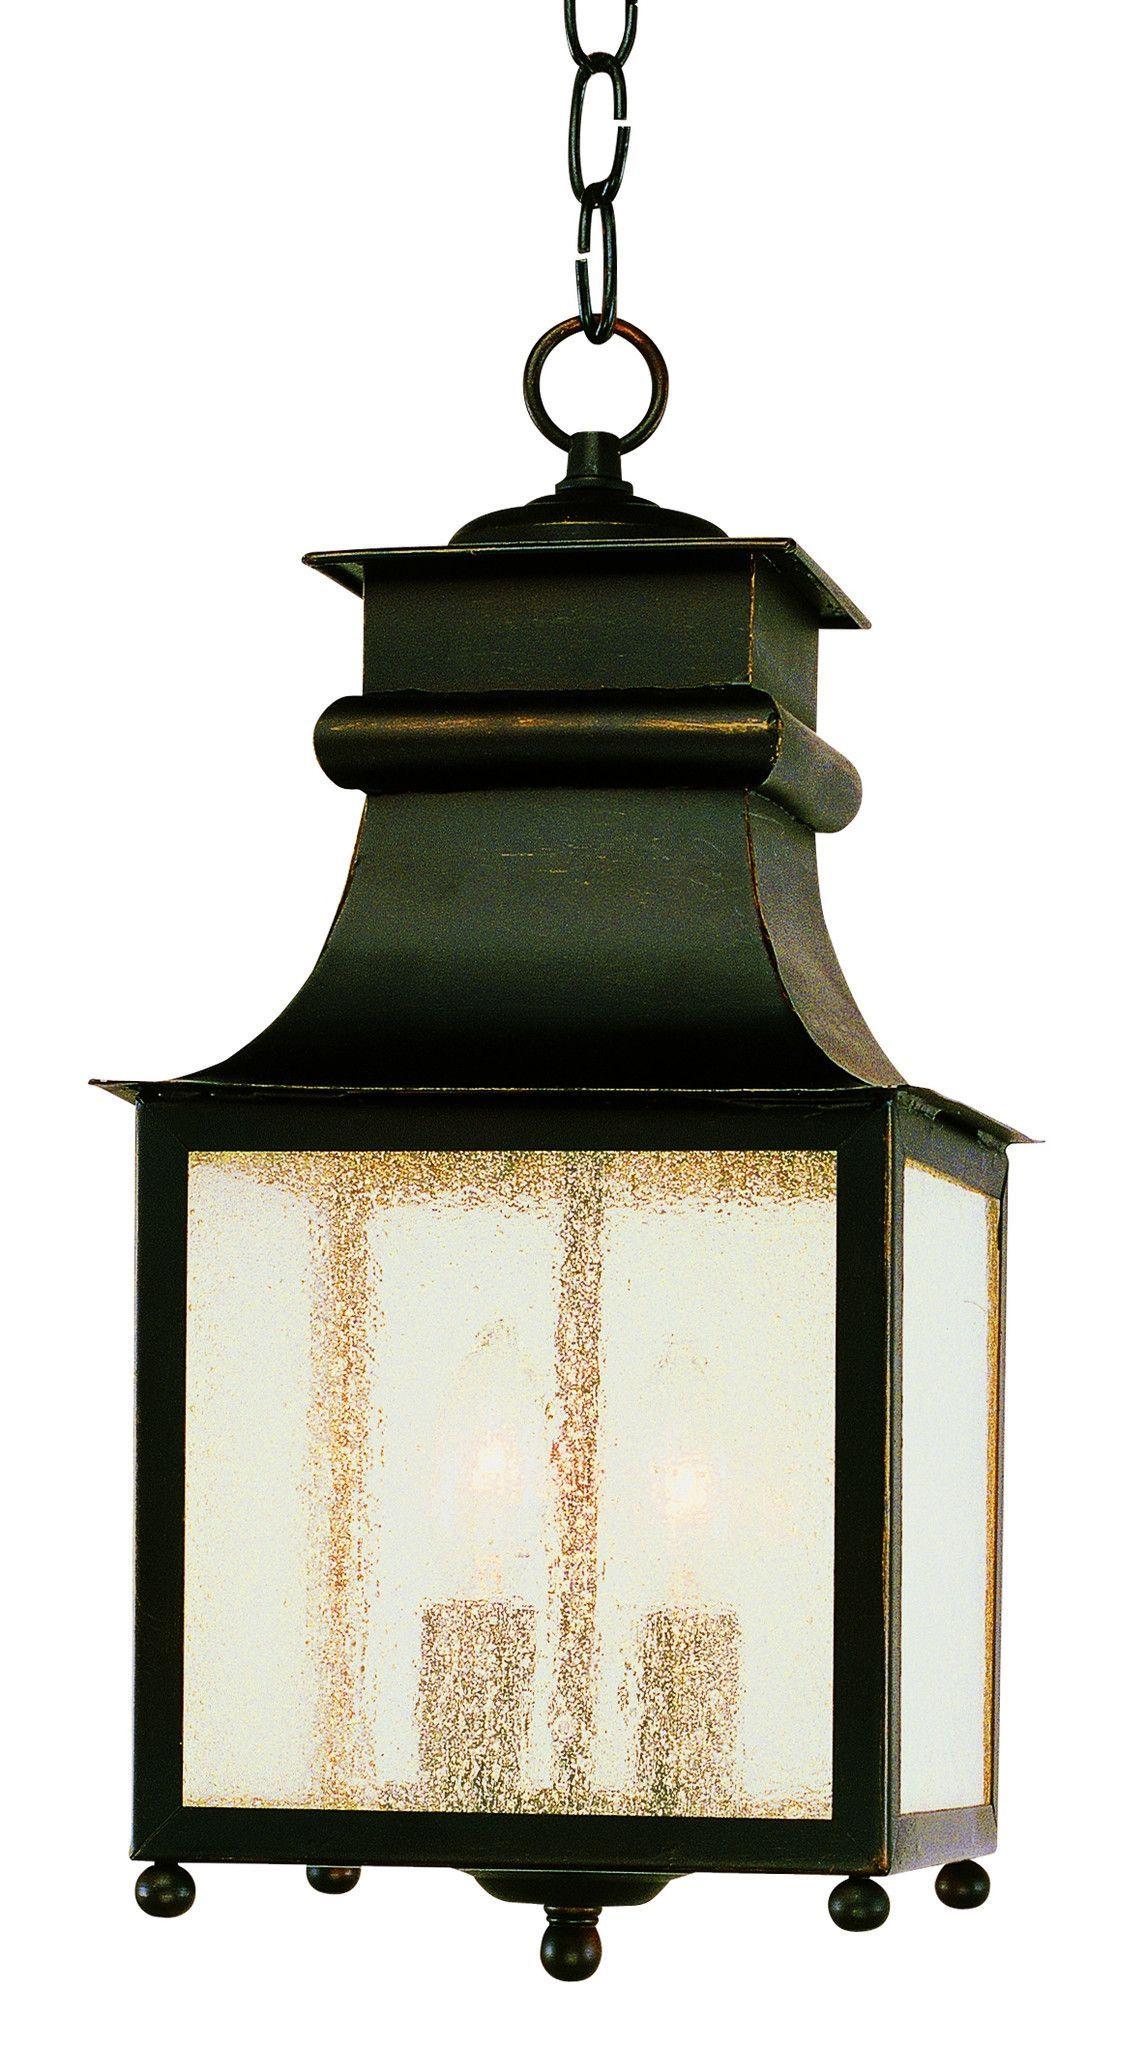 Trans globe lighting 45633 wb la paz 16 high hanging lantern trans globe lighting 45633 wb la paz 16 high hanging lantern aloadofball Gallery